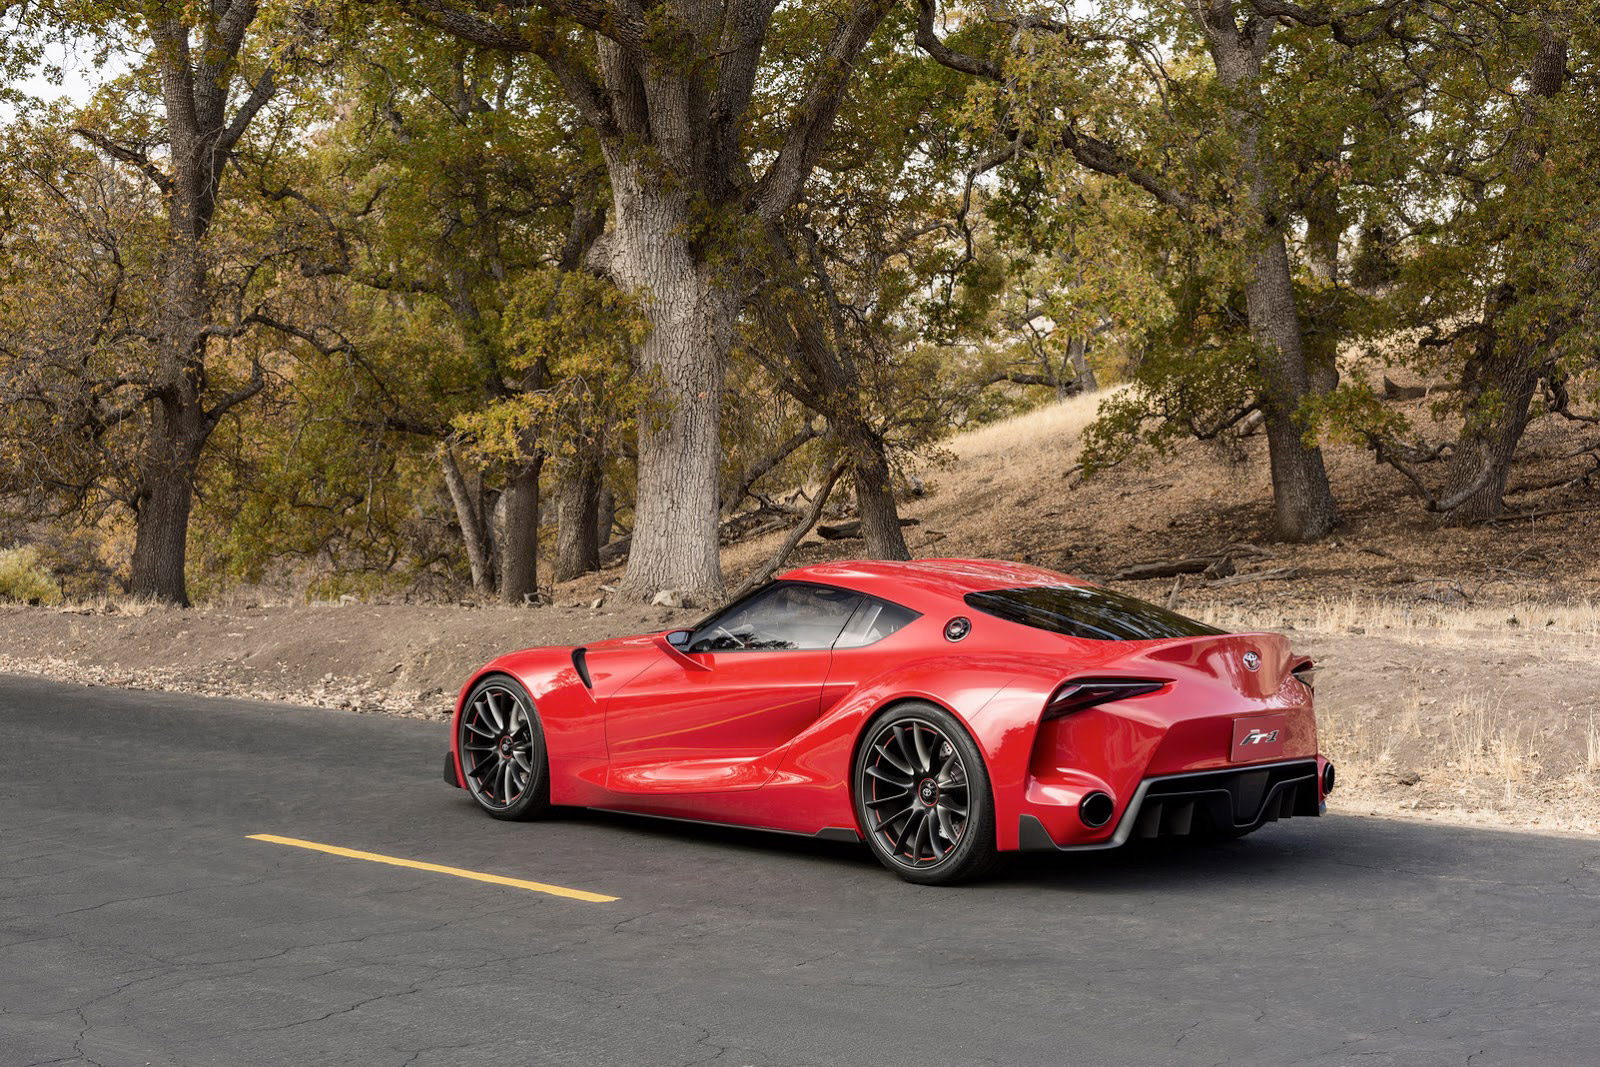 2017 Nissan GT-R, 2017 Porsche Macan GTS, next Toyota Supra: The Week In Reverse